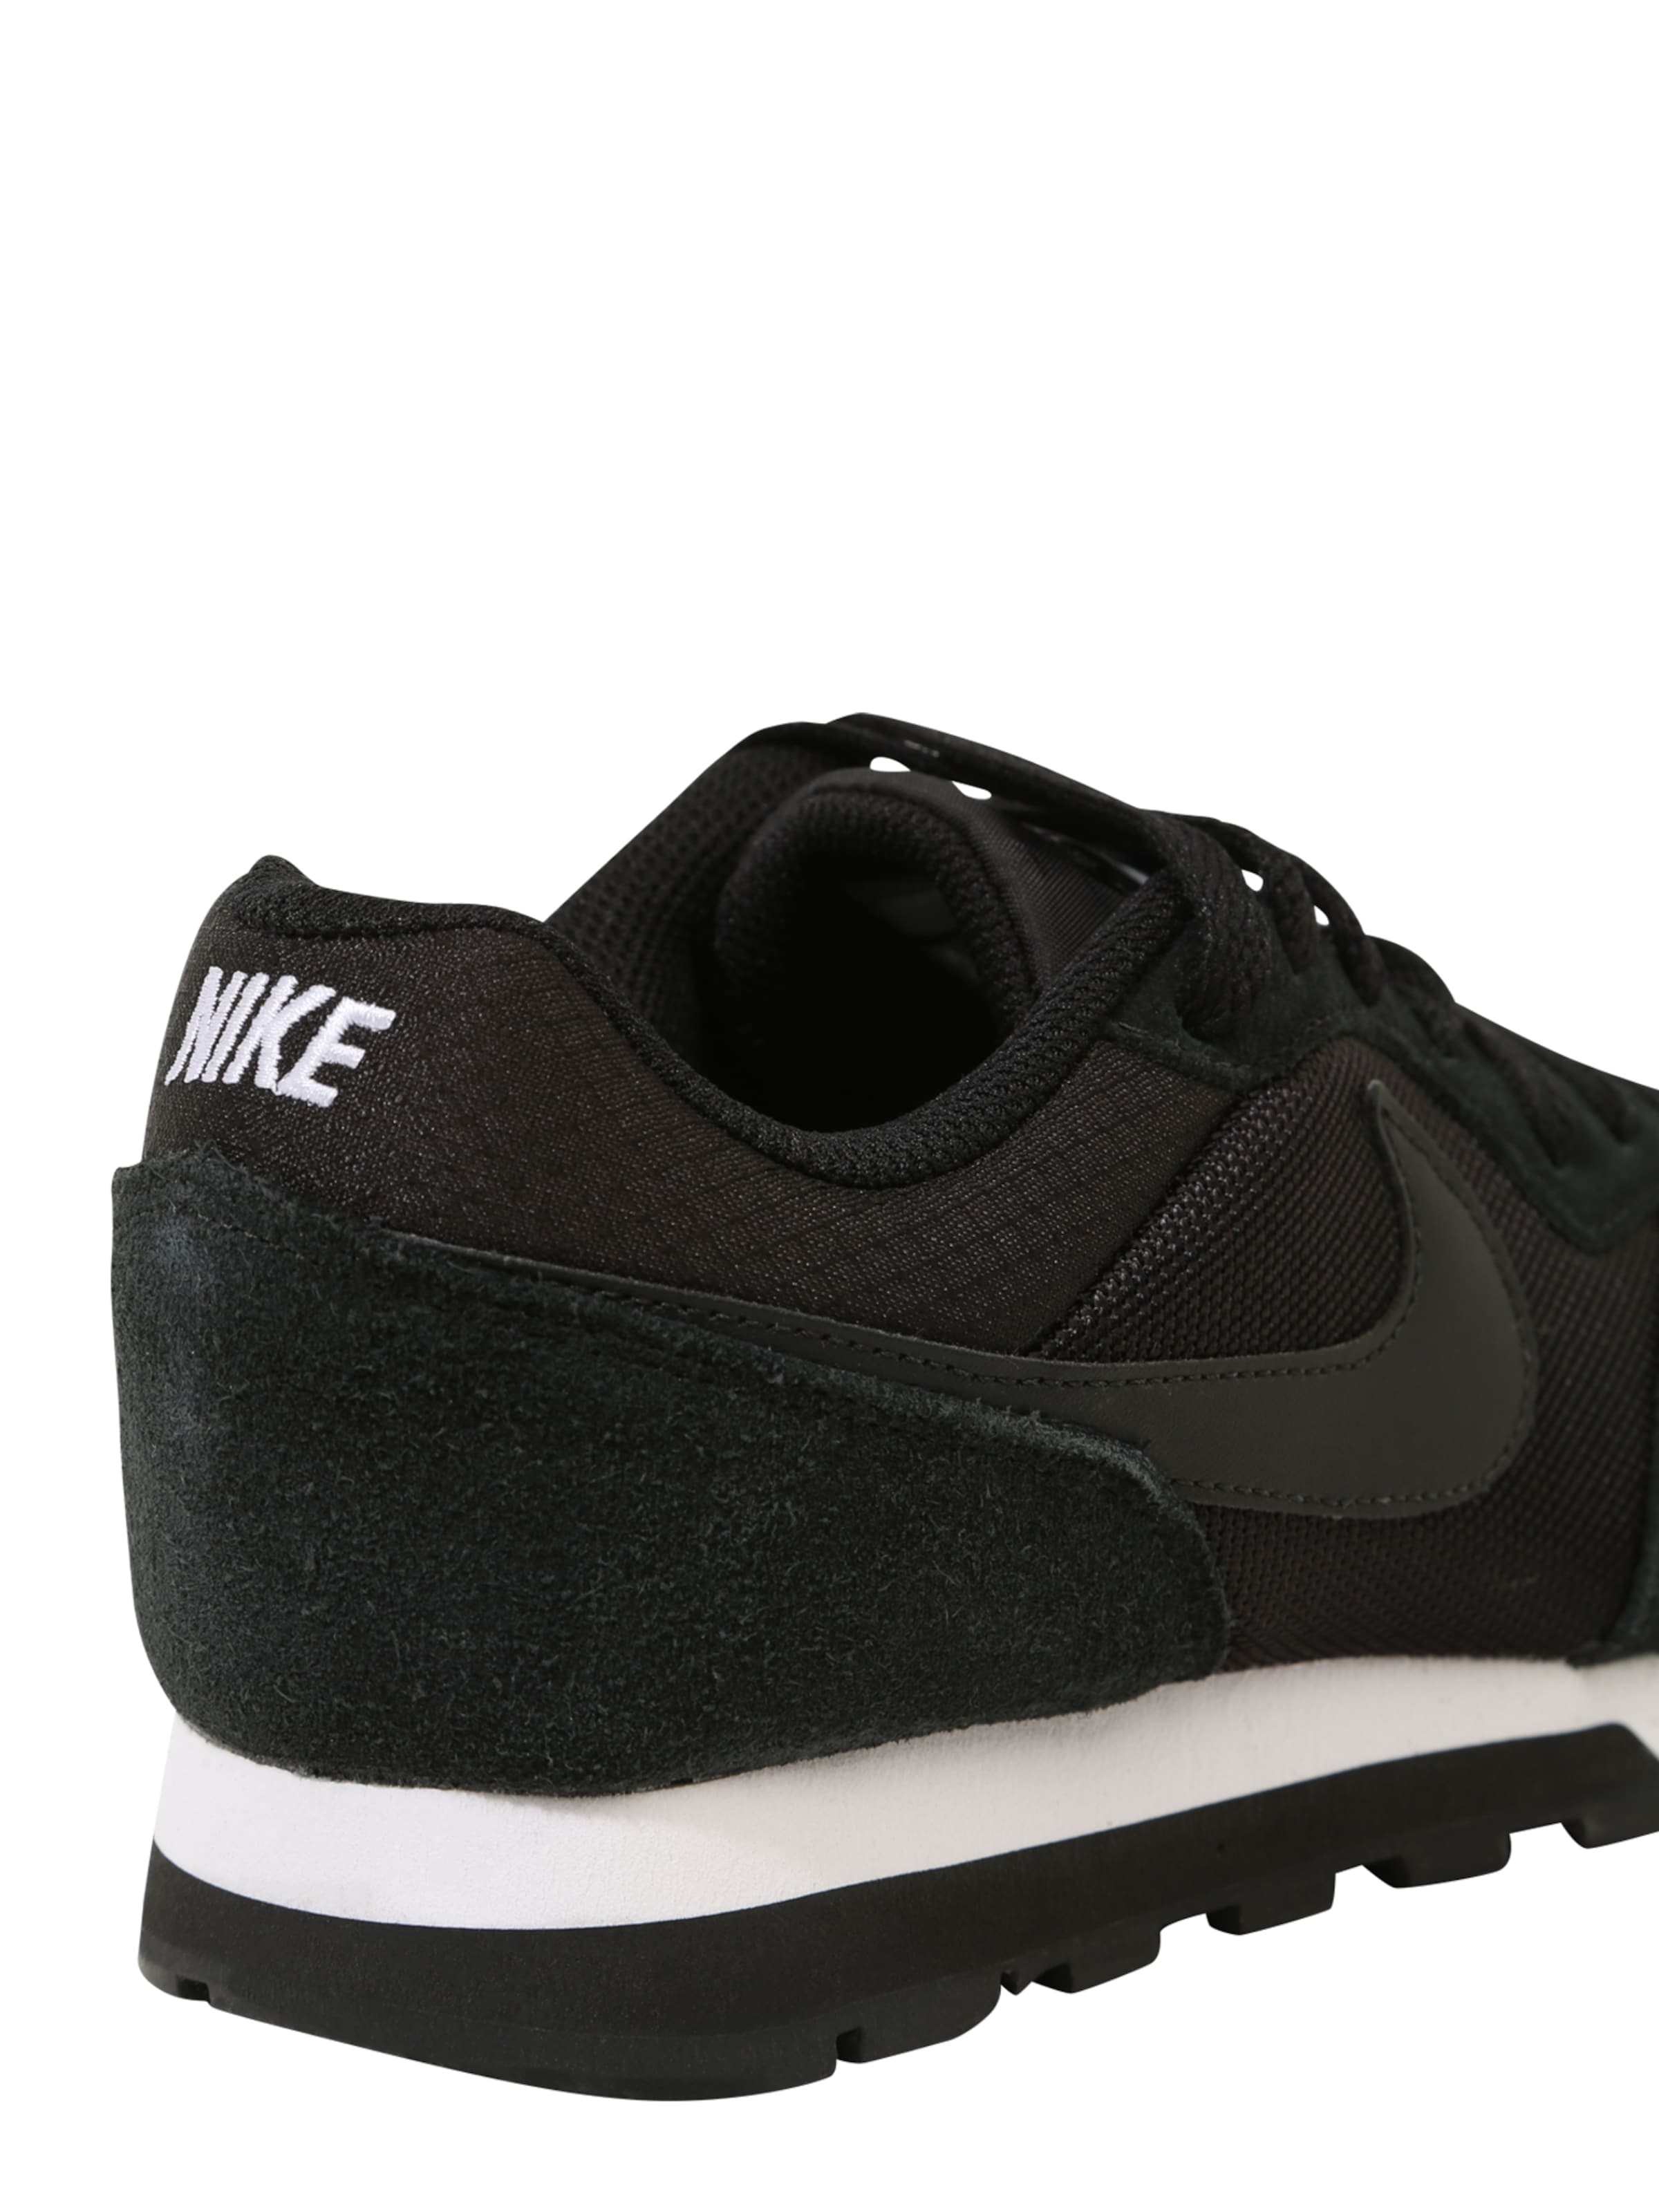 Nike Sportswear Turnschuhe Low 'Runner 2 Leder, Textil Billige Herren- Herren- Herren- und Damenschuhe 50548f